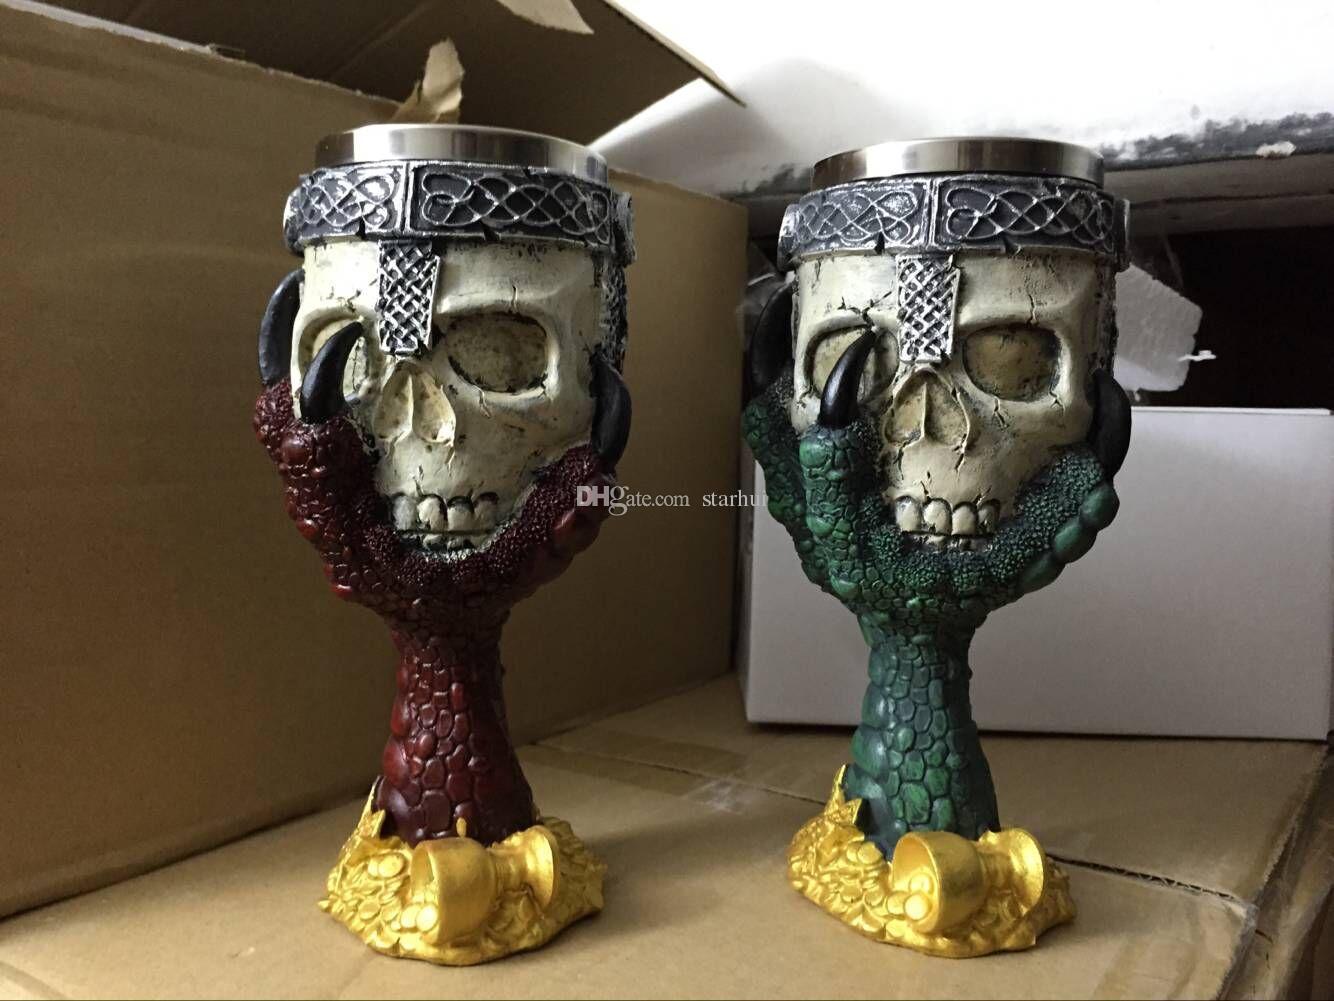 3D 두개골 머그잔 벽 스테인레스 스틸 컵 200-400ml 커피 맥주 차 컵 나이트 Tankard 드래곤 마 찻잔 무료 DHL WX C10